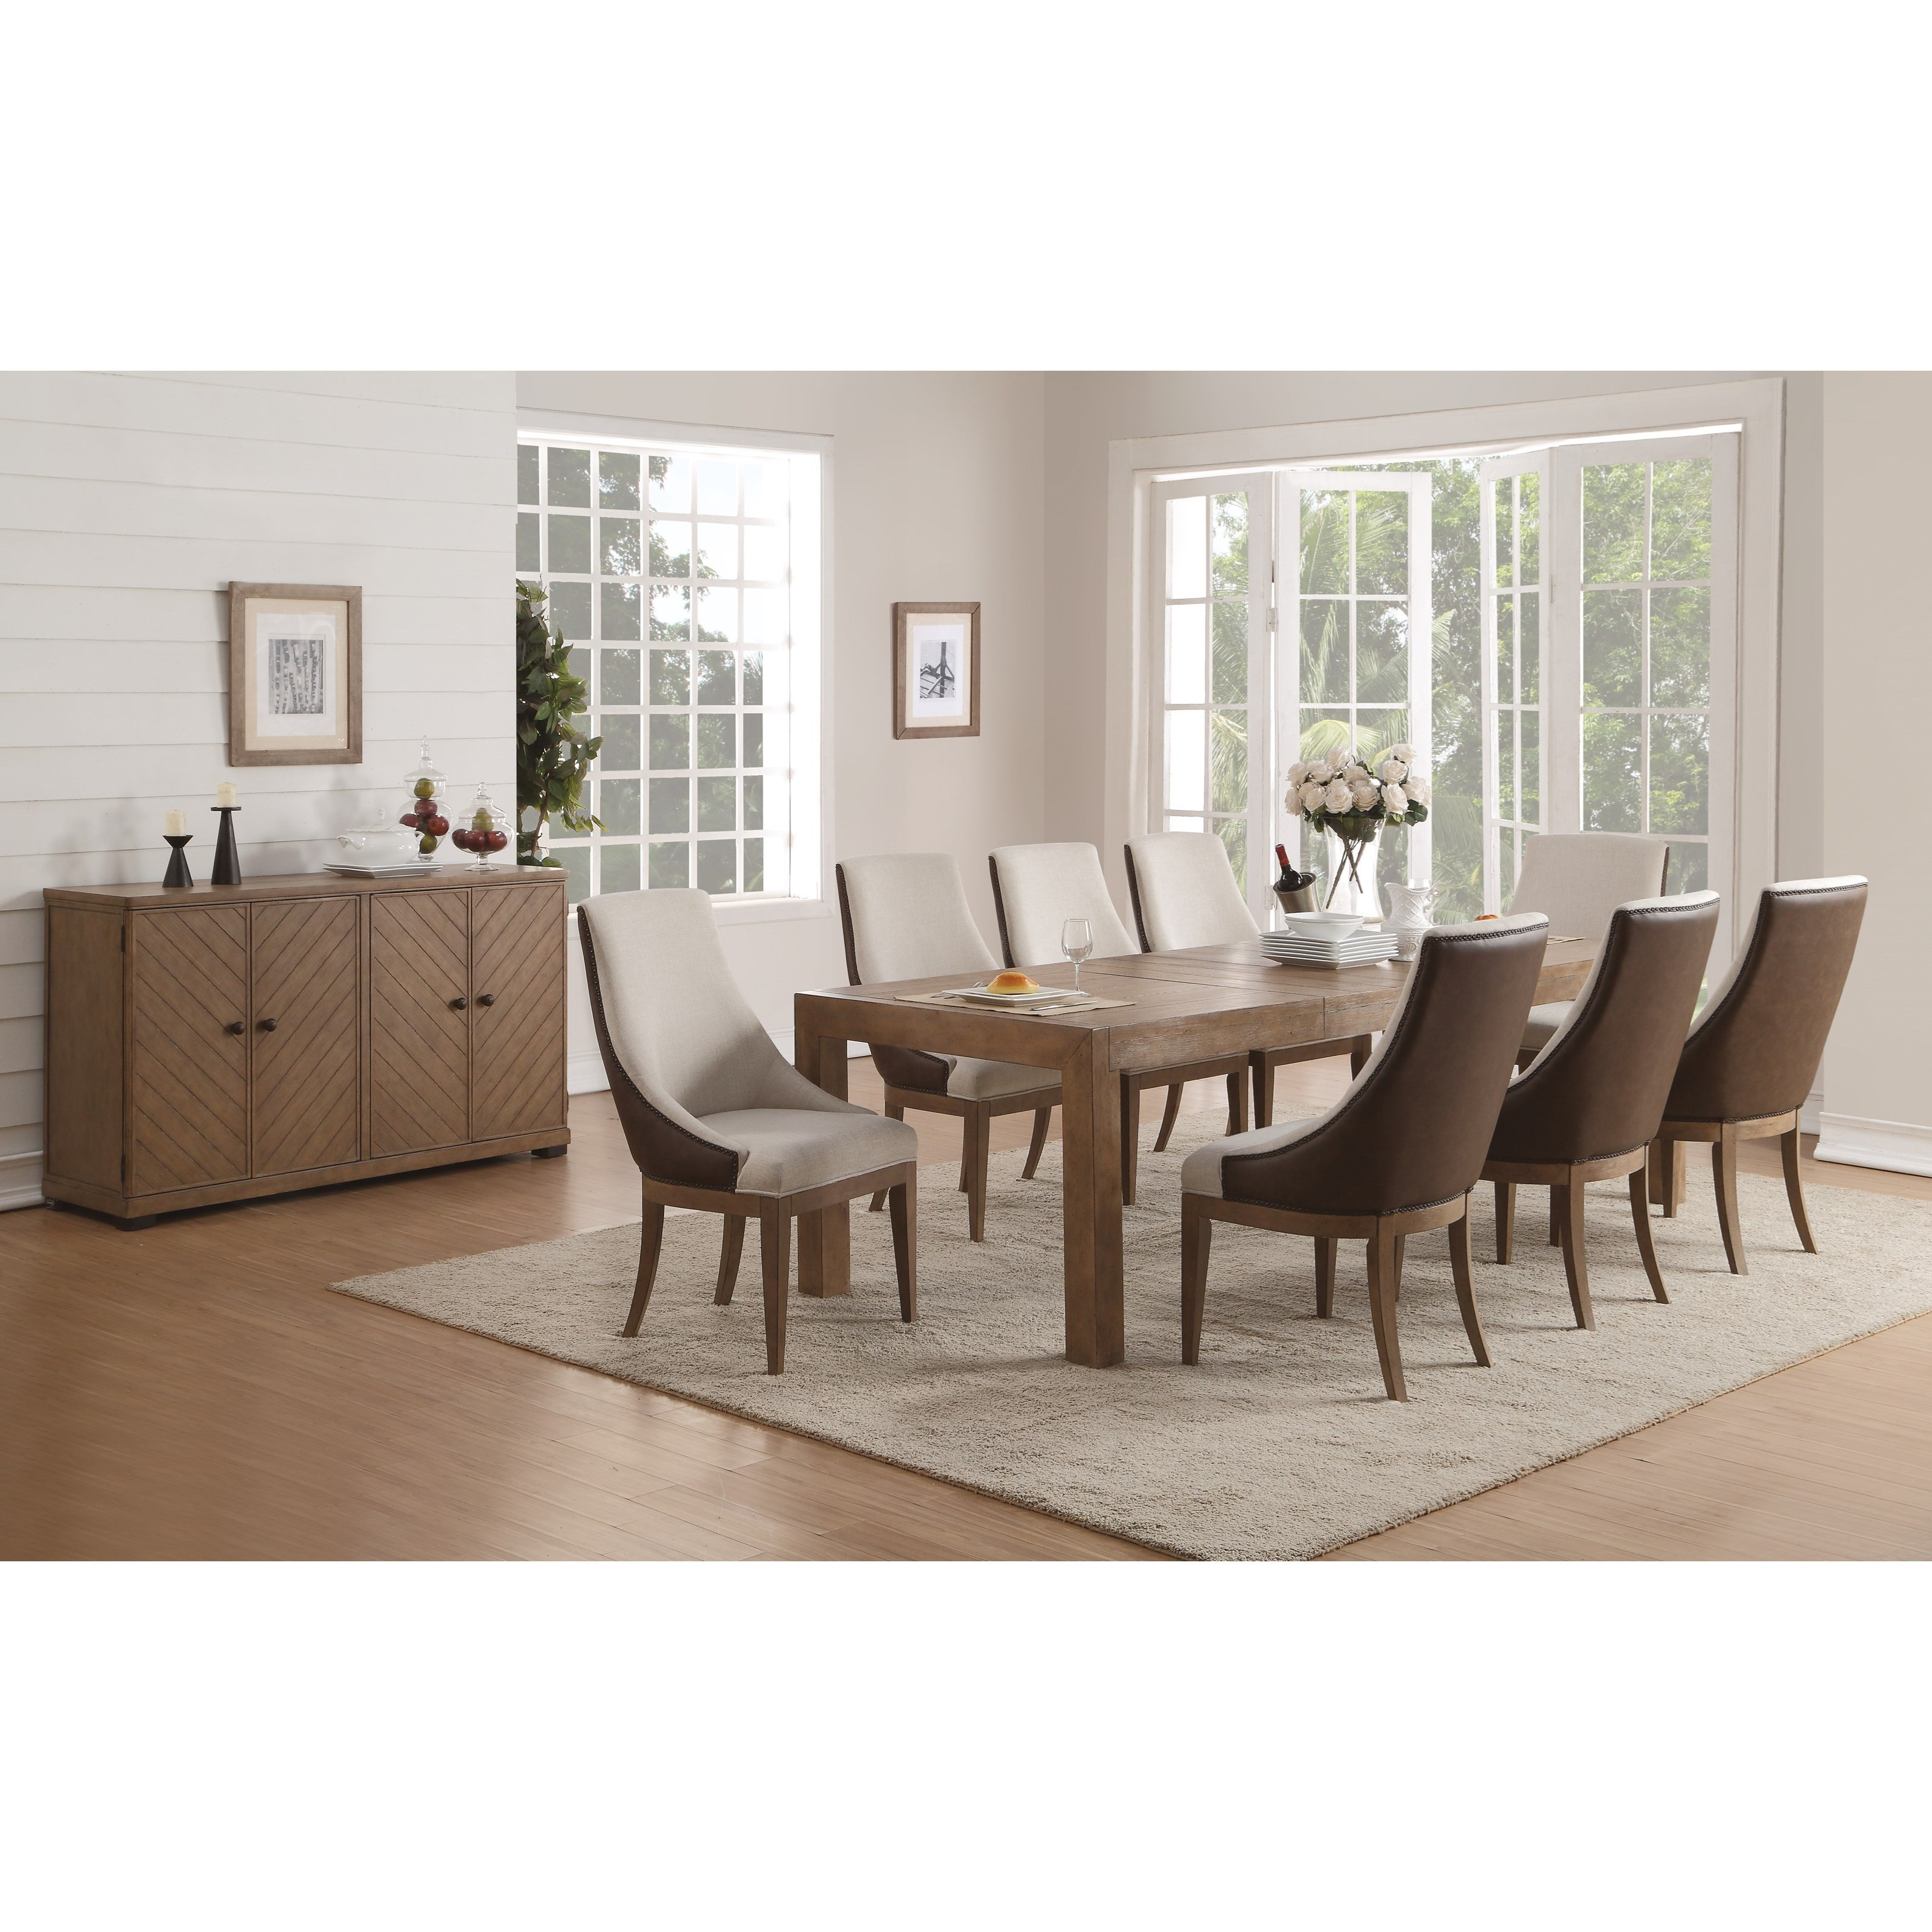 Flexsteel Wynwood Collection Carmen Formal Dining Room Group - Item Number: W1146 Dining Room Group 6